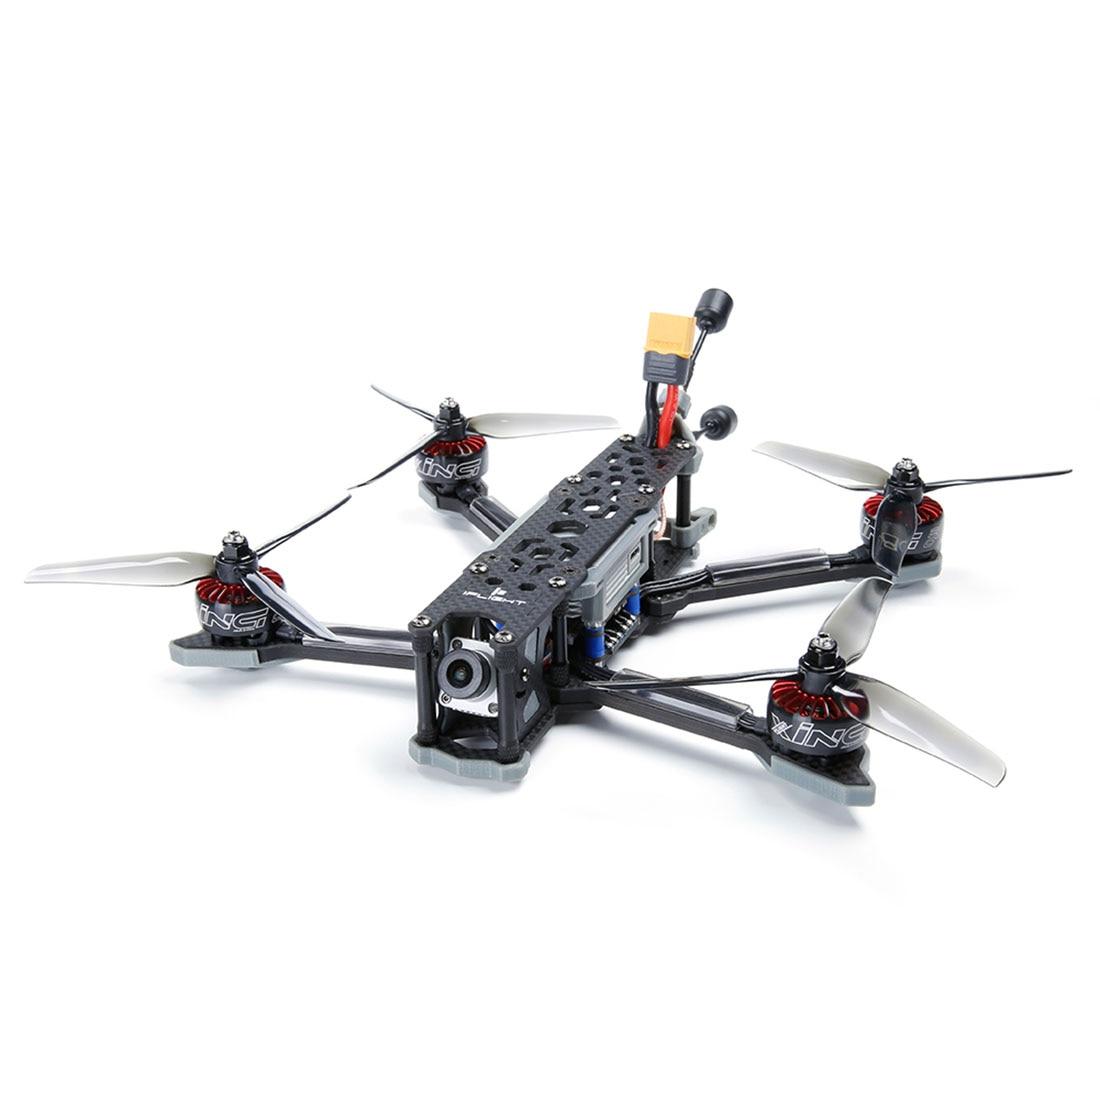 IFlight TITAN DC5 5 zoll 222mm 4 s/6 s HD FPV Racing Drone BNF SucceX D f7 50A Stapel XING E 2207 2450/1800KV Motor Hubschrauber Spielzeug - 2